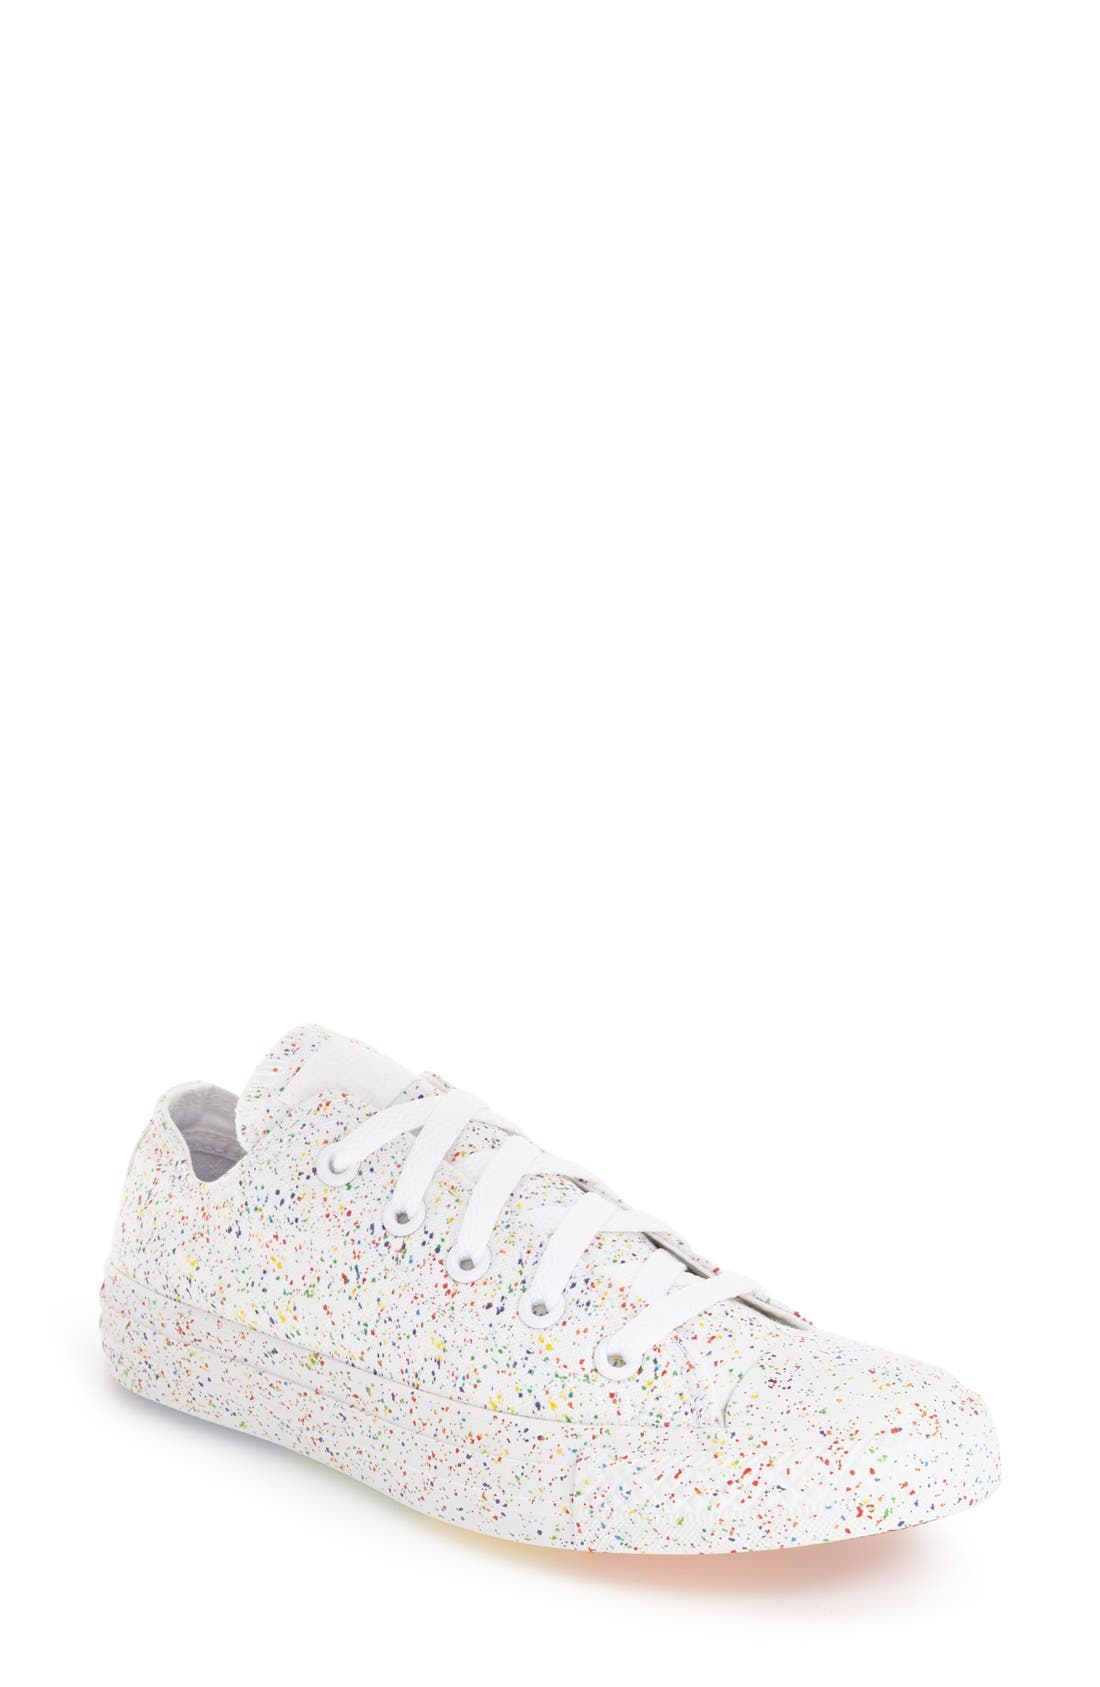 Main Image - Converse Chuck Taylor® All Star® 'Pride' Sneaker (Women)